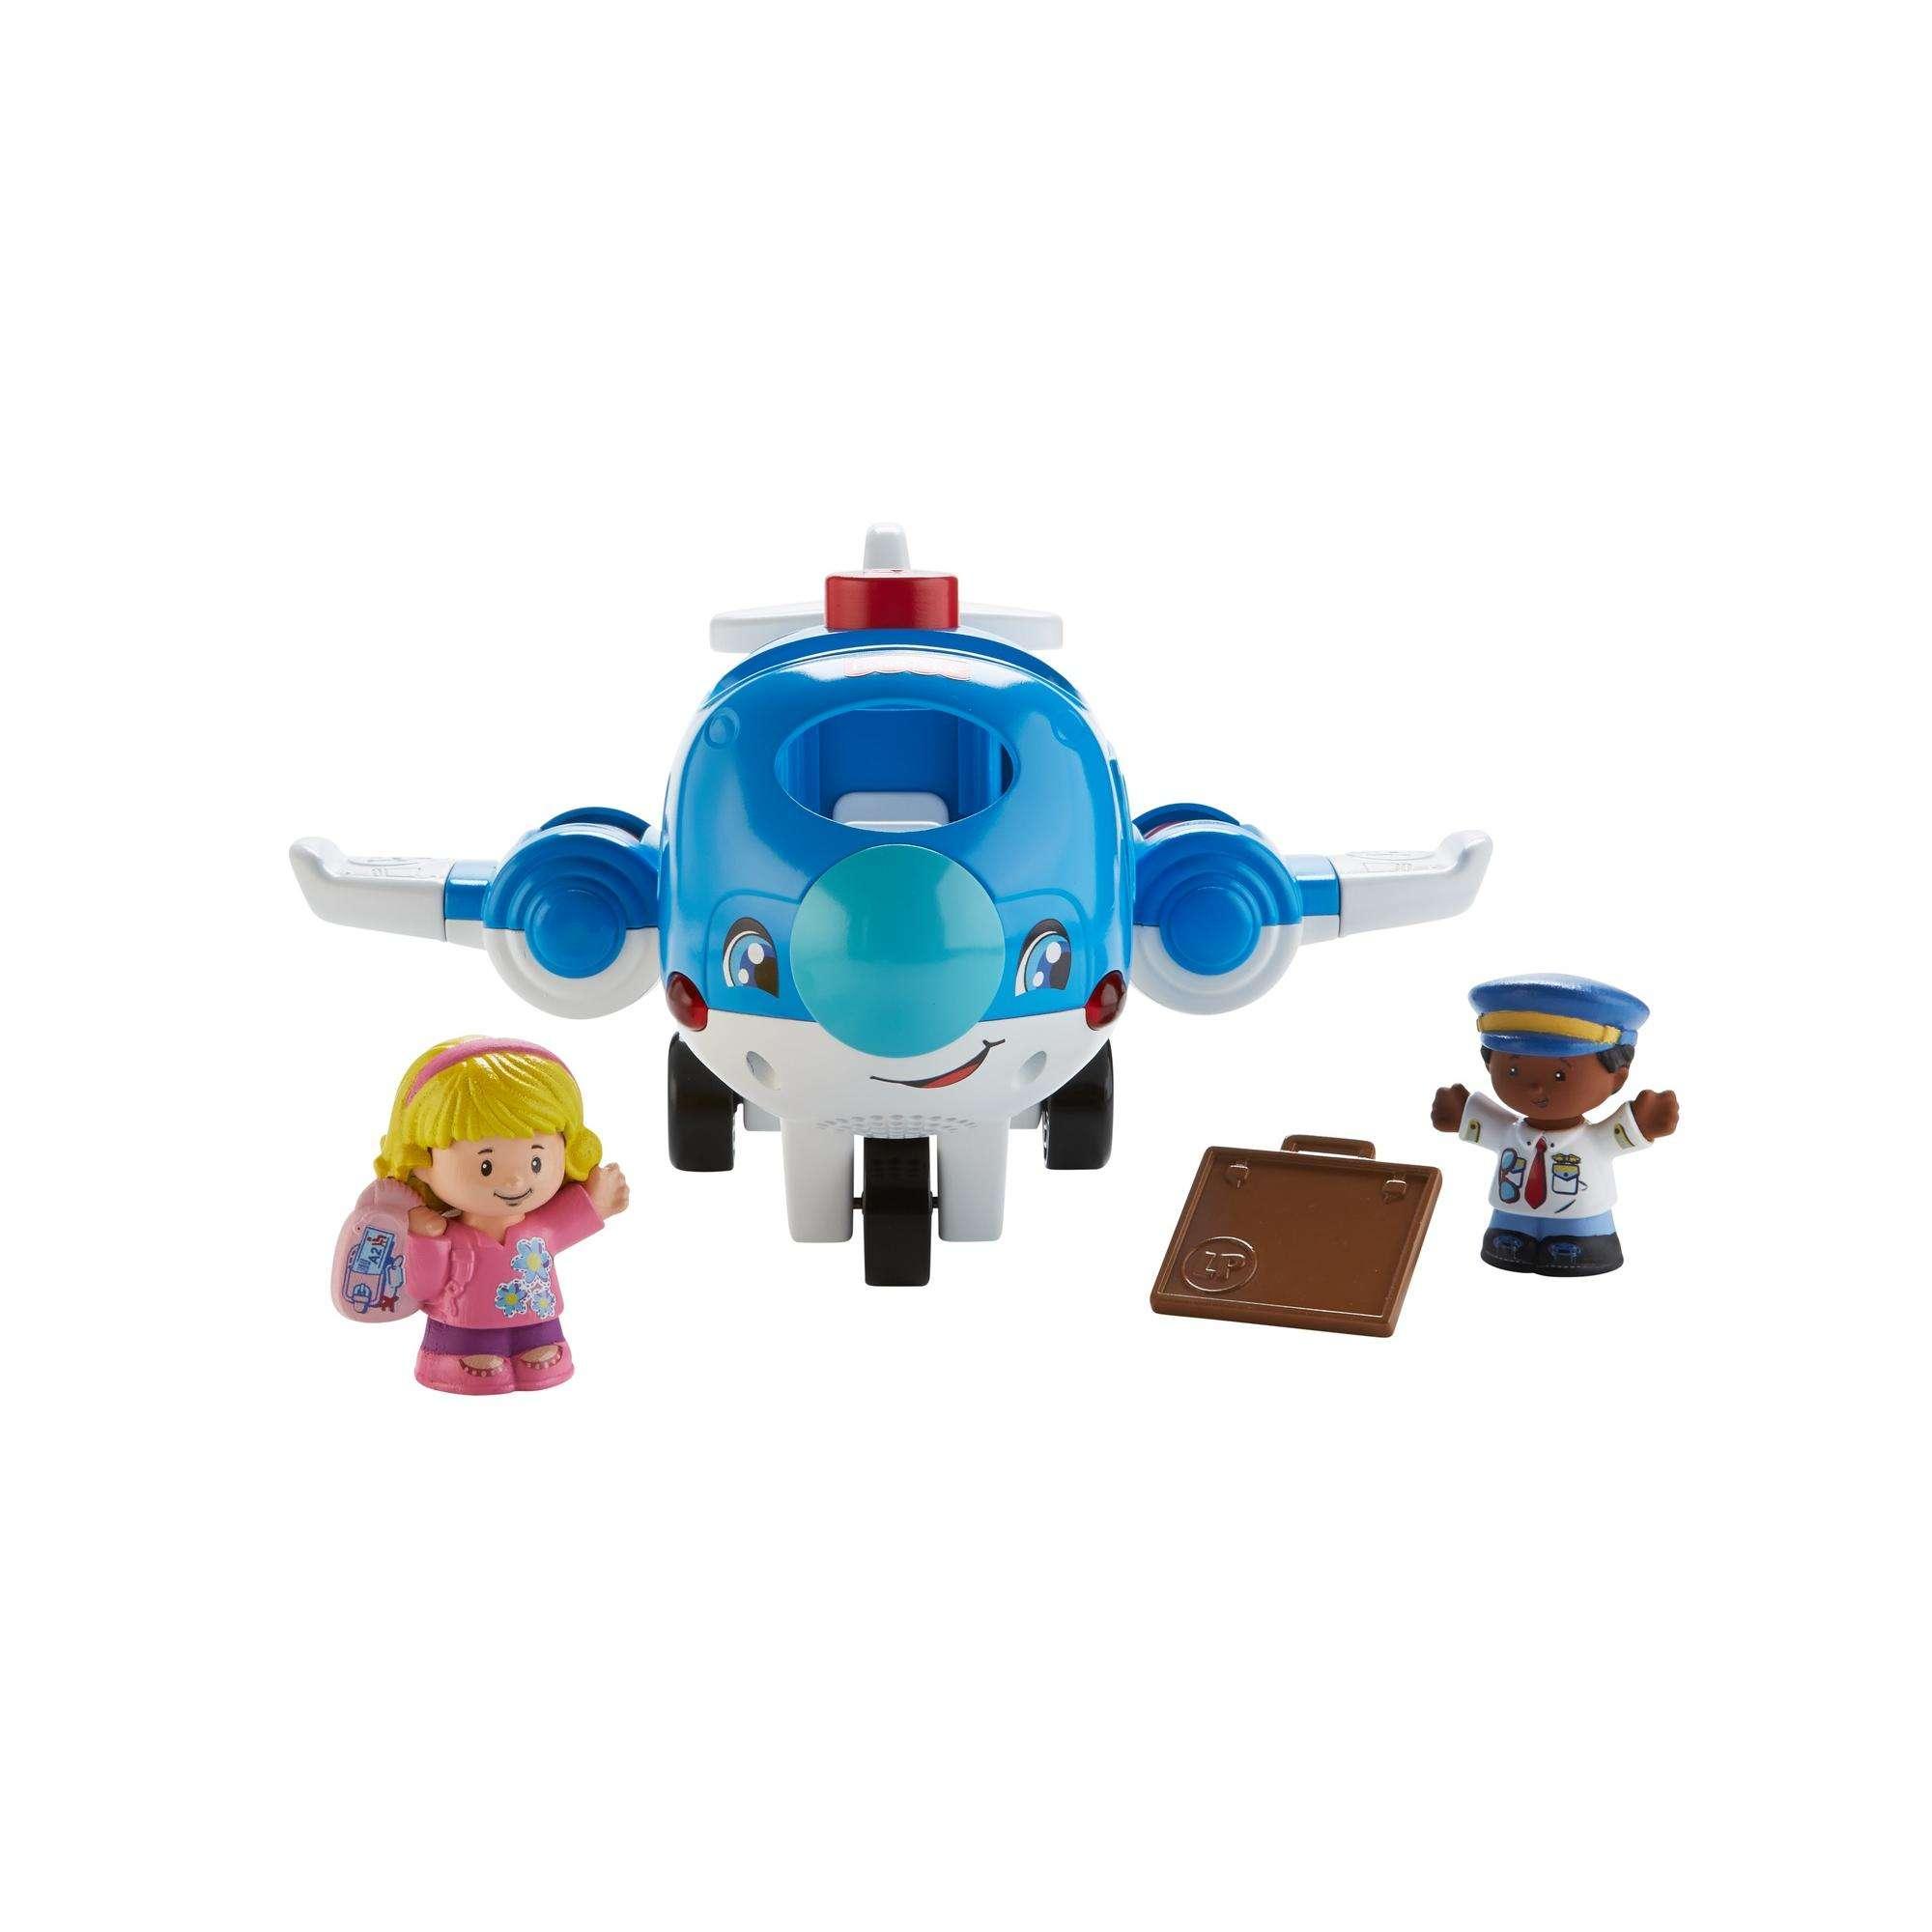 Little People - Flyvemaskine (dansk)